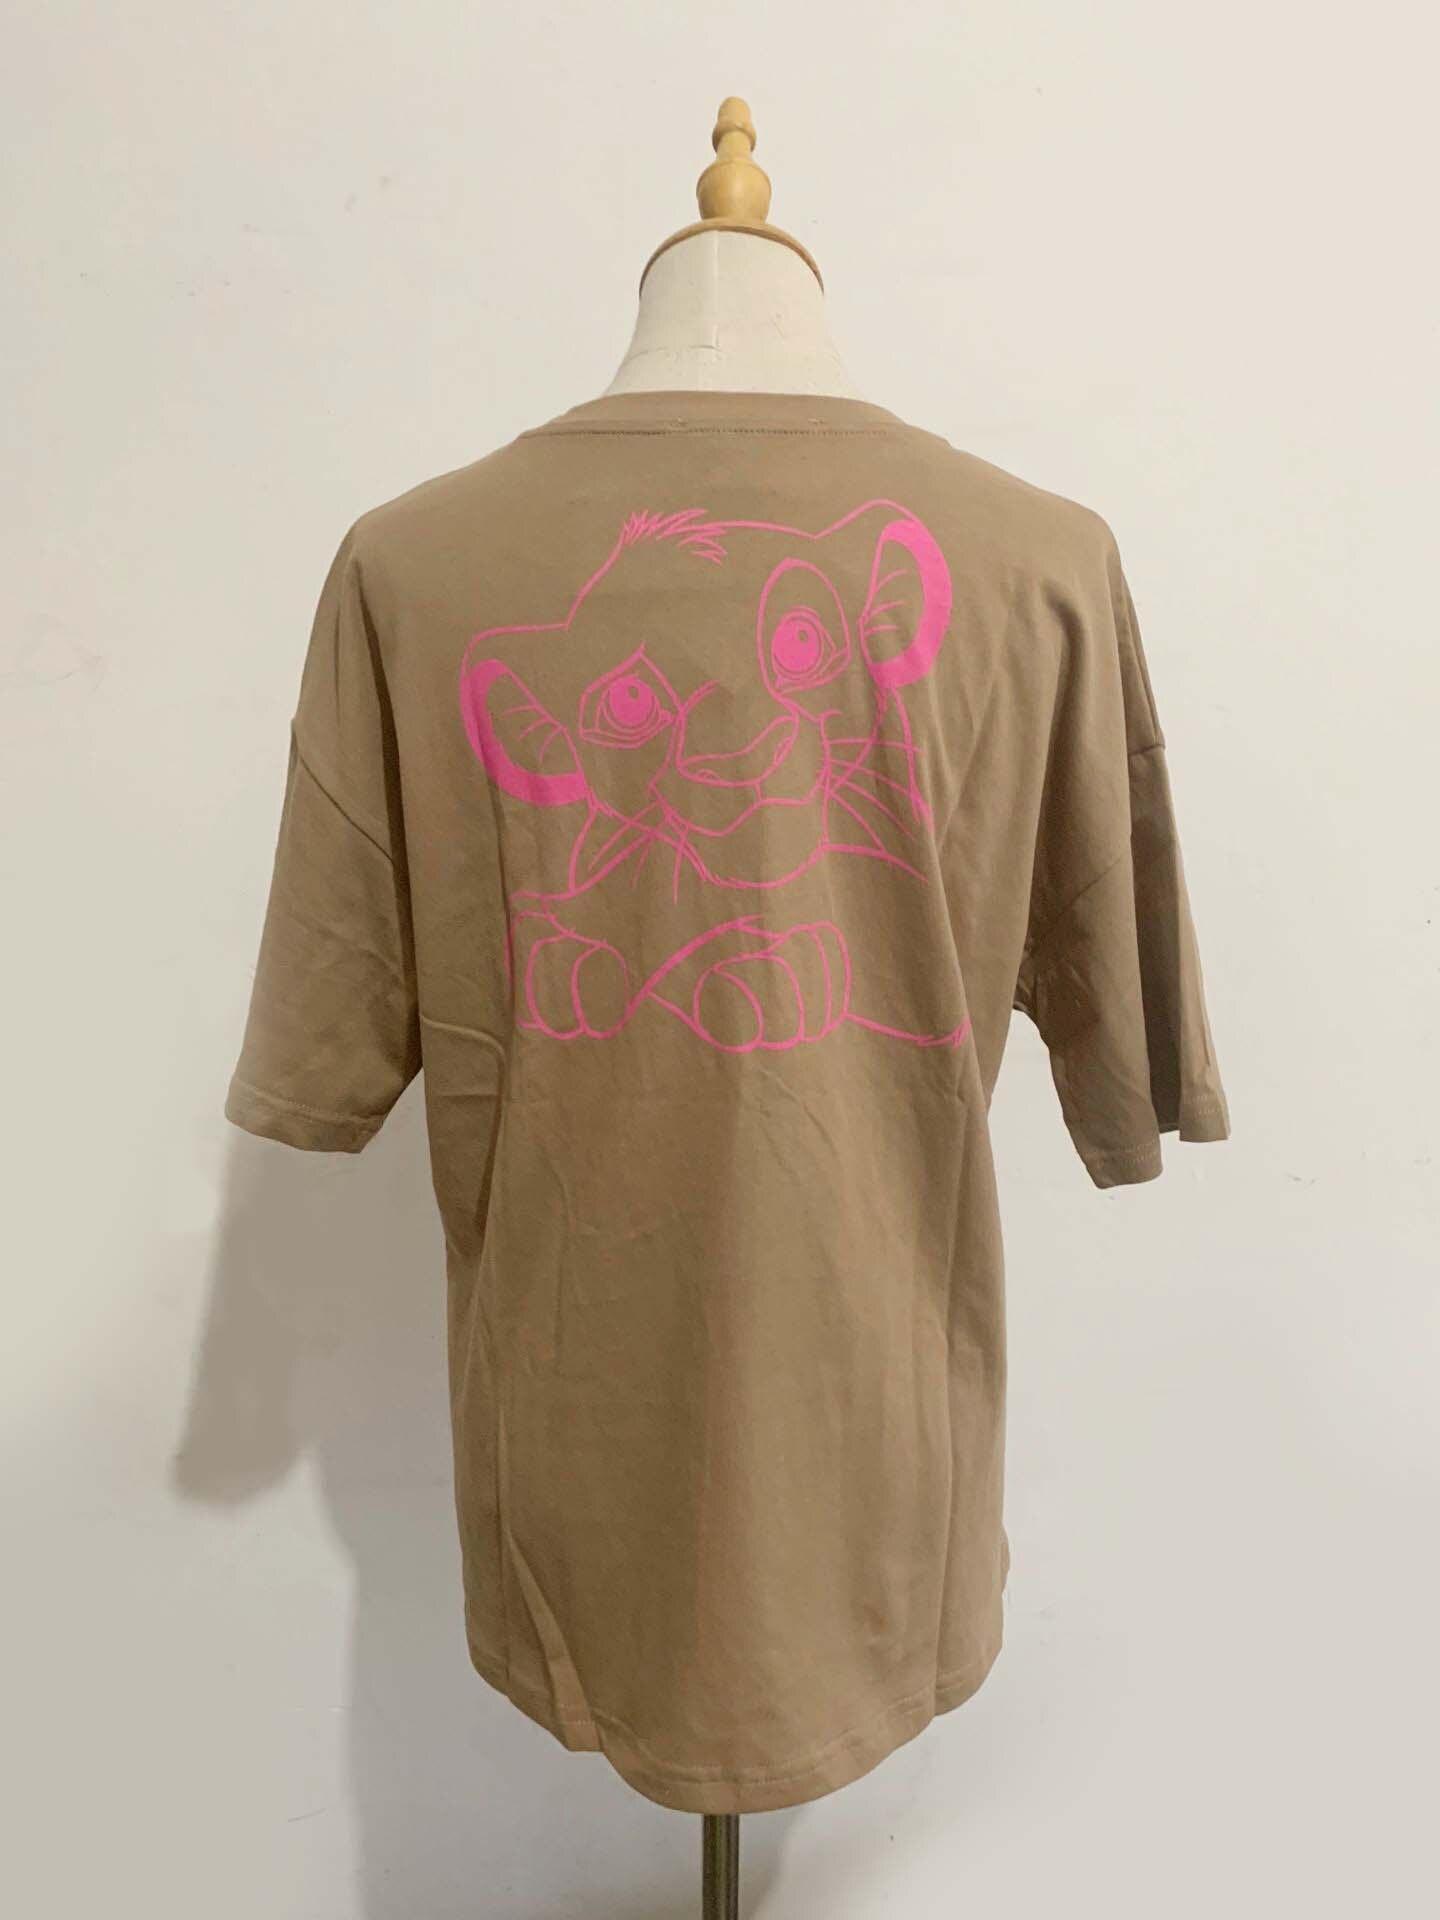 H30471bc92d7d44a7b5434c5f9d9866aeq Disney Family T-Shirt Fashion Winnie the Pooh Mickey Mouse Stitch Fairy Dumbo SIMBA Cartoon Print Women T-Shirt Cotton Tee s